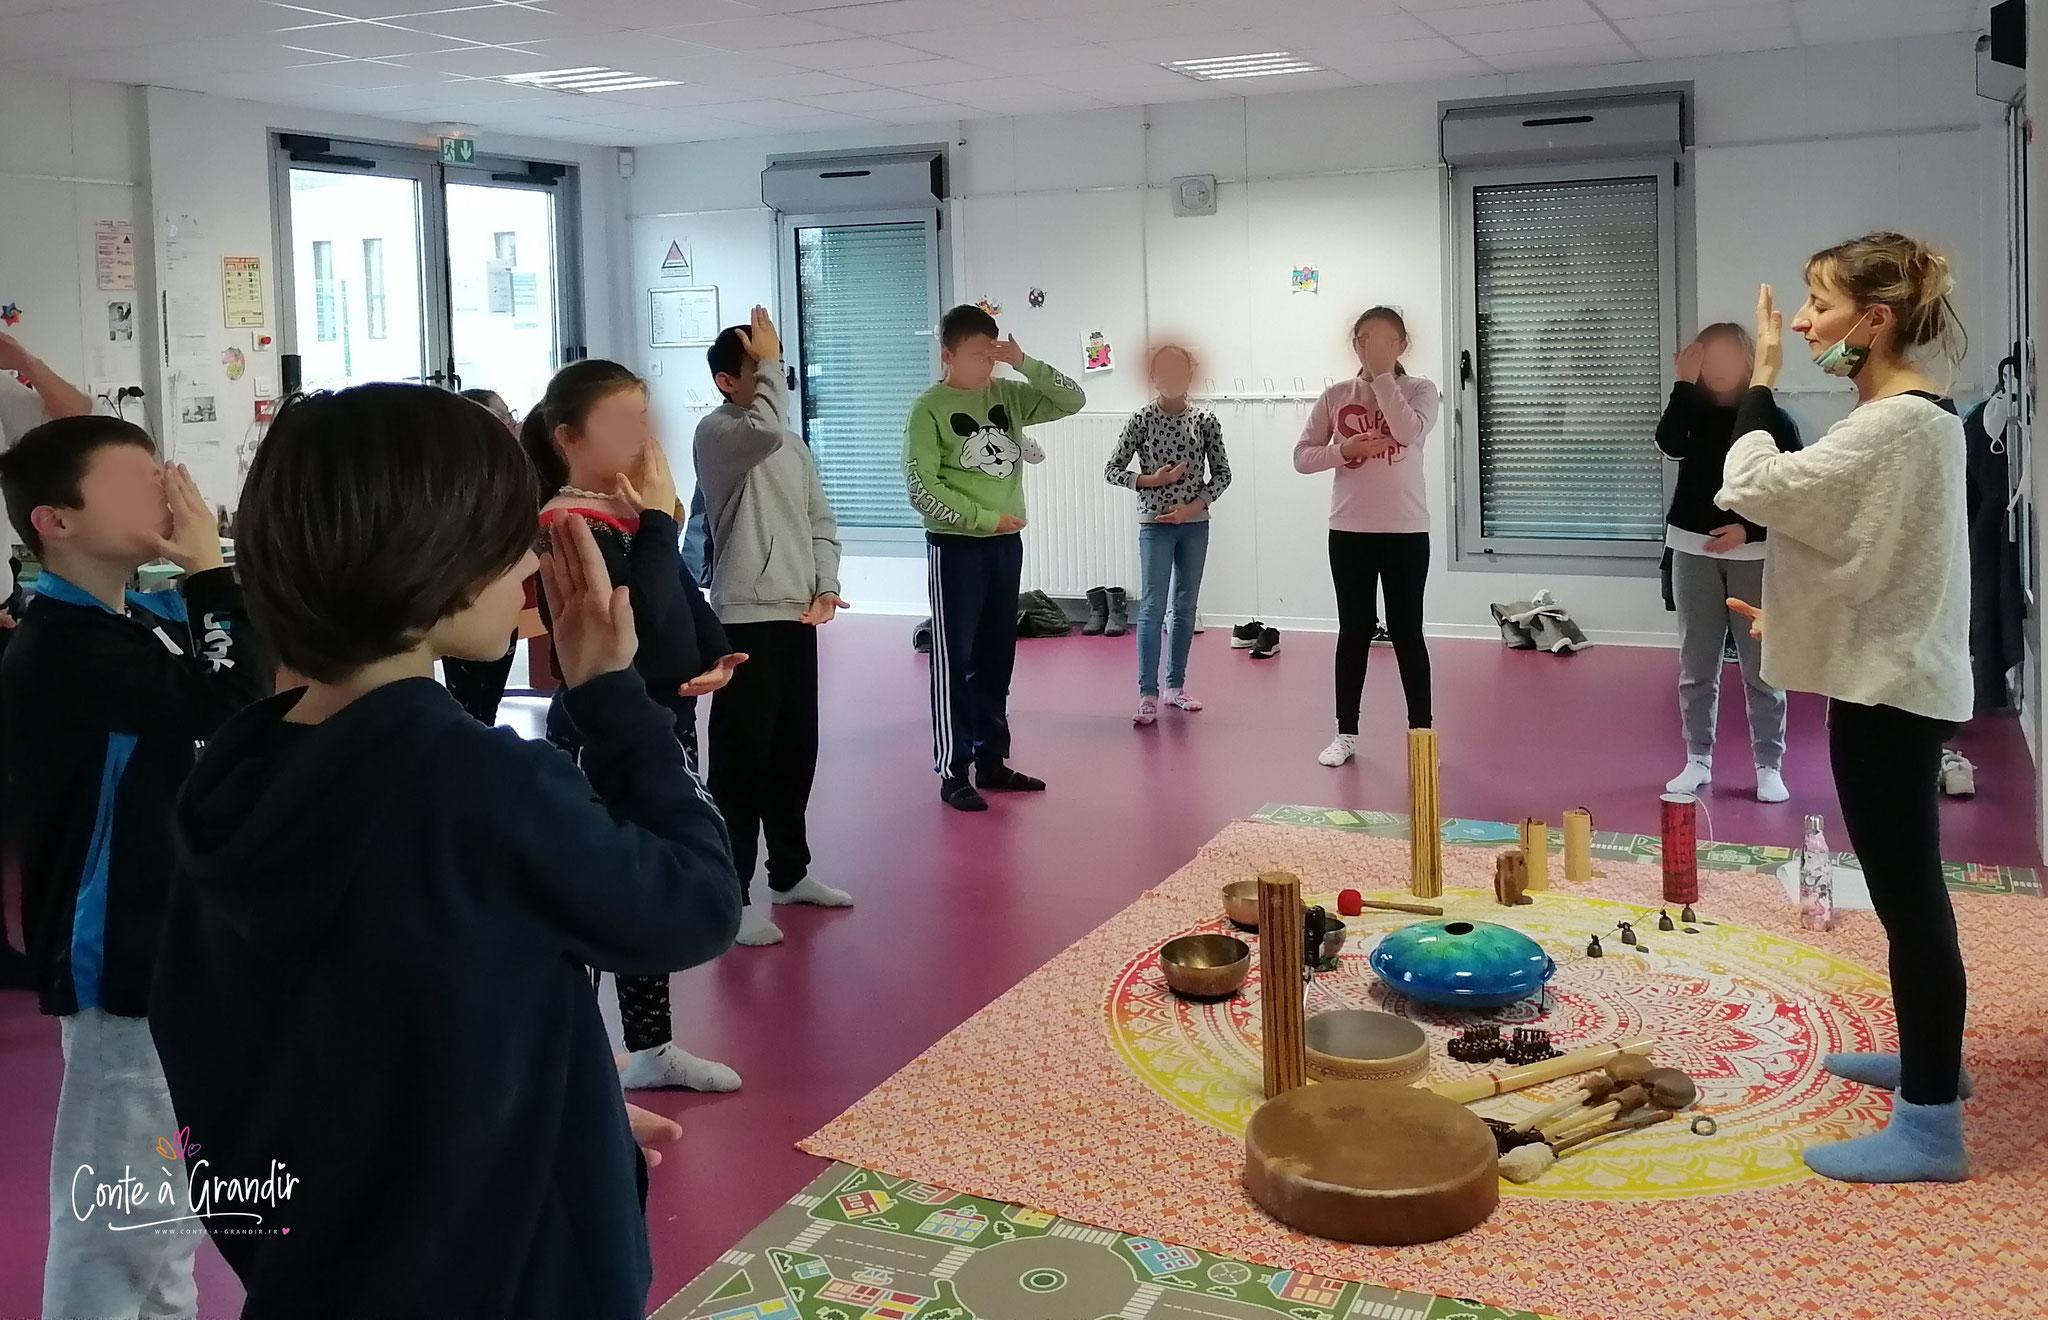 méditation, qi gong, enfant, vendée